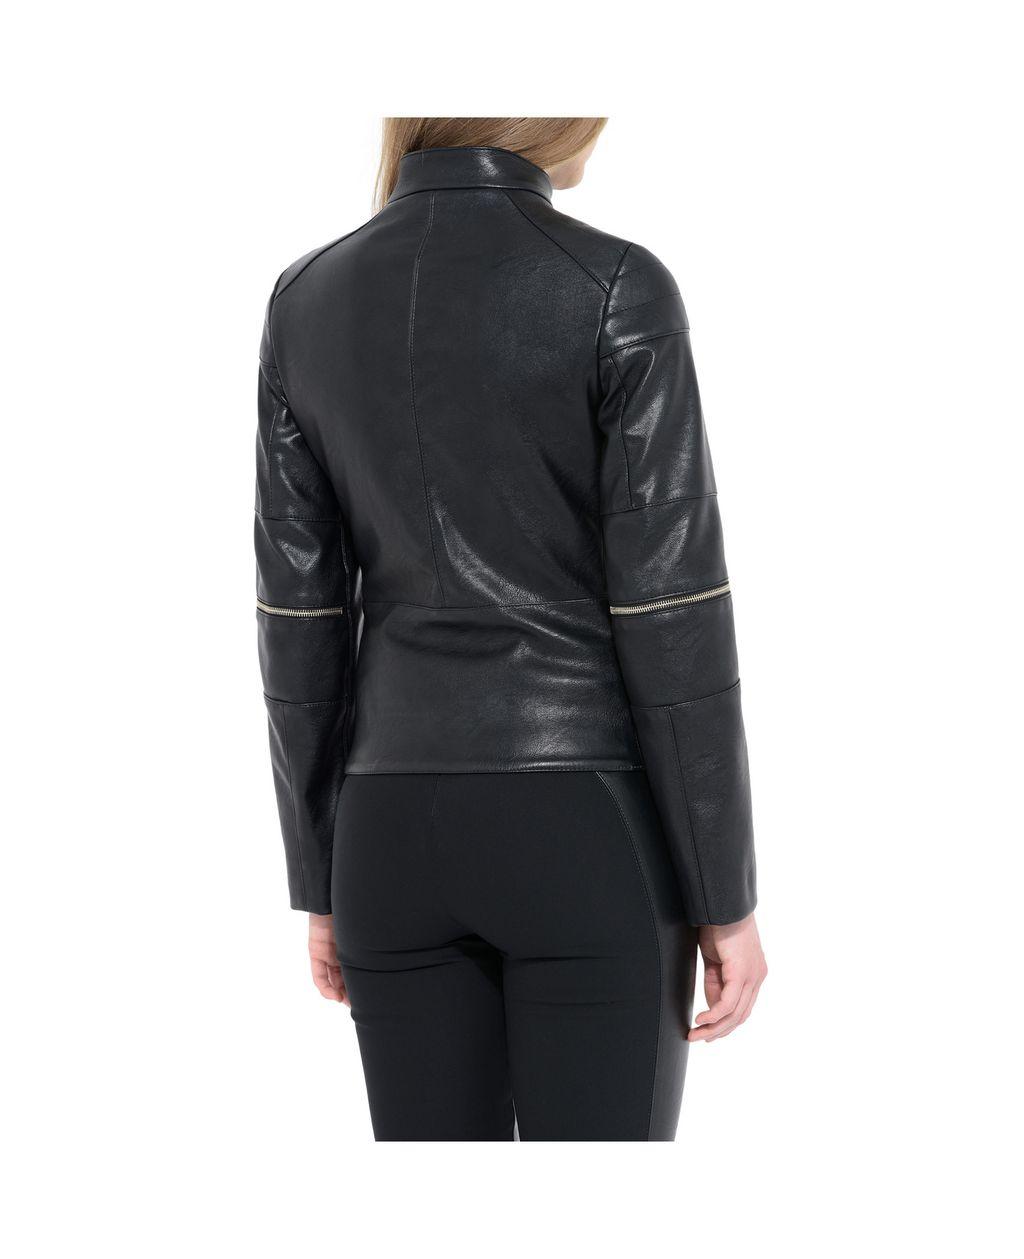 Victoire Skin Free Skin Leather Jacket - STELLA MCCARTNEY